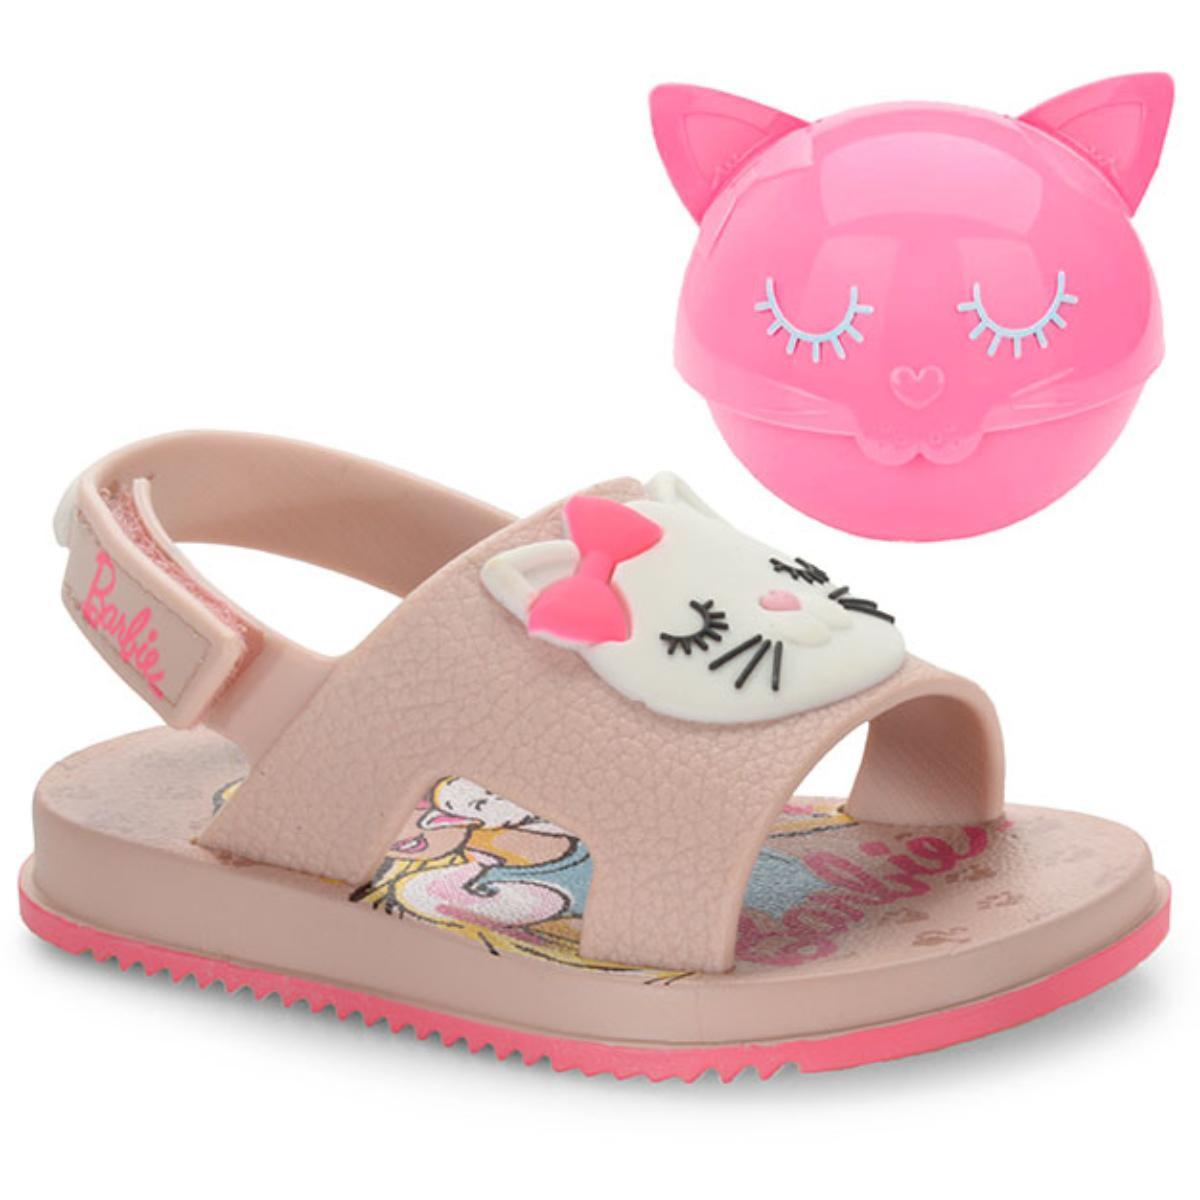 Sandália Feminina Grendene 22150 21819 Barbie Fashion Cat Rosa/branco